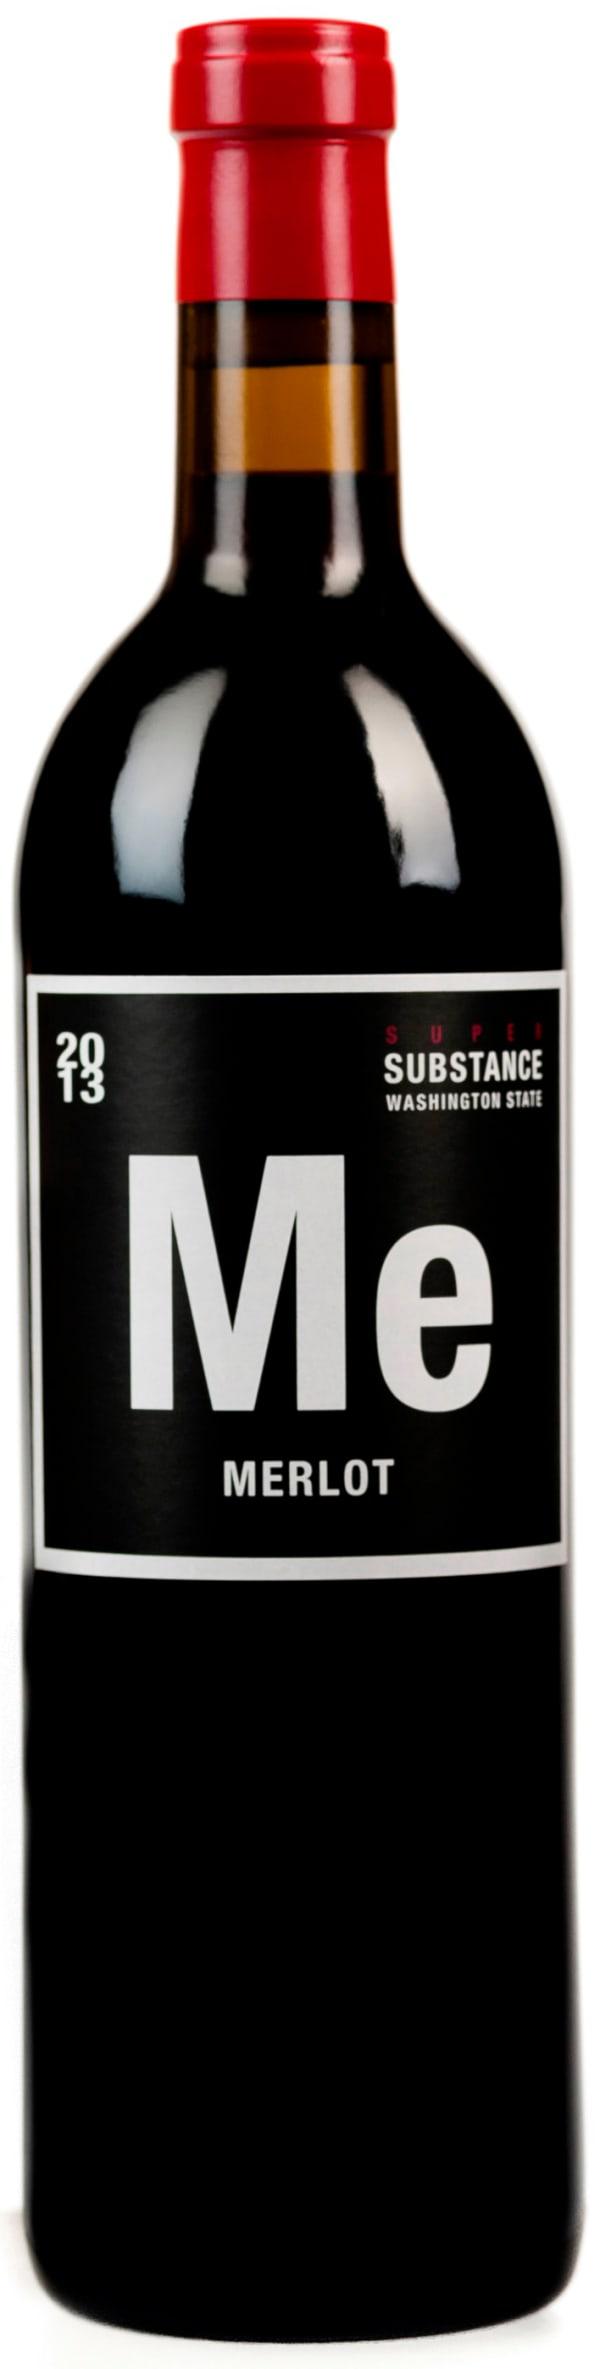 Wines of Substance Me Merlot 2013